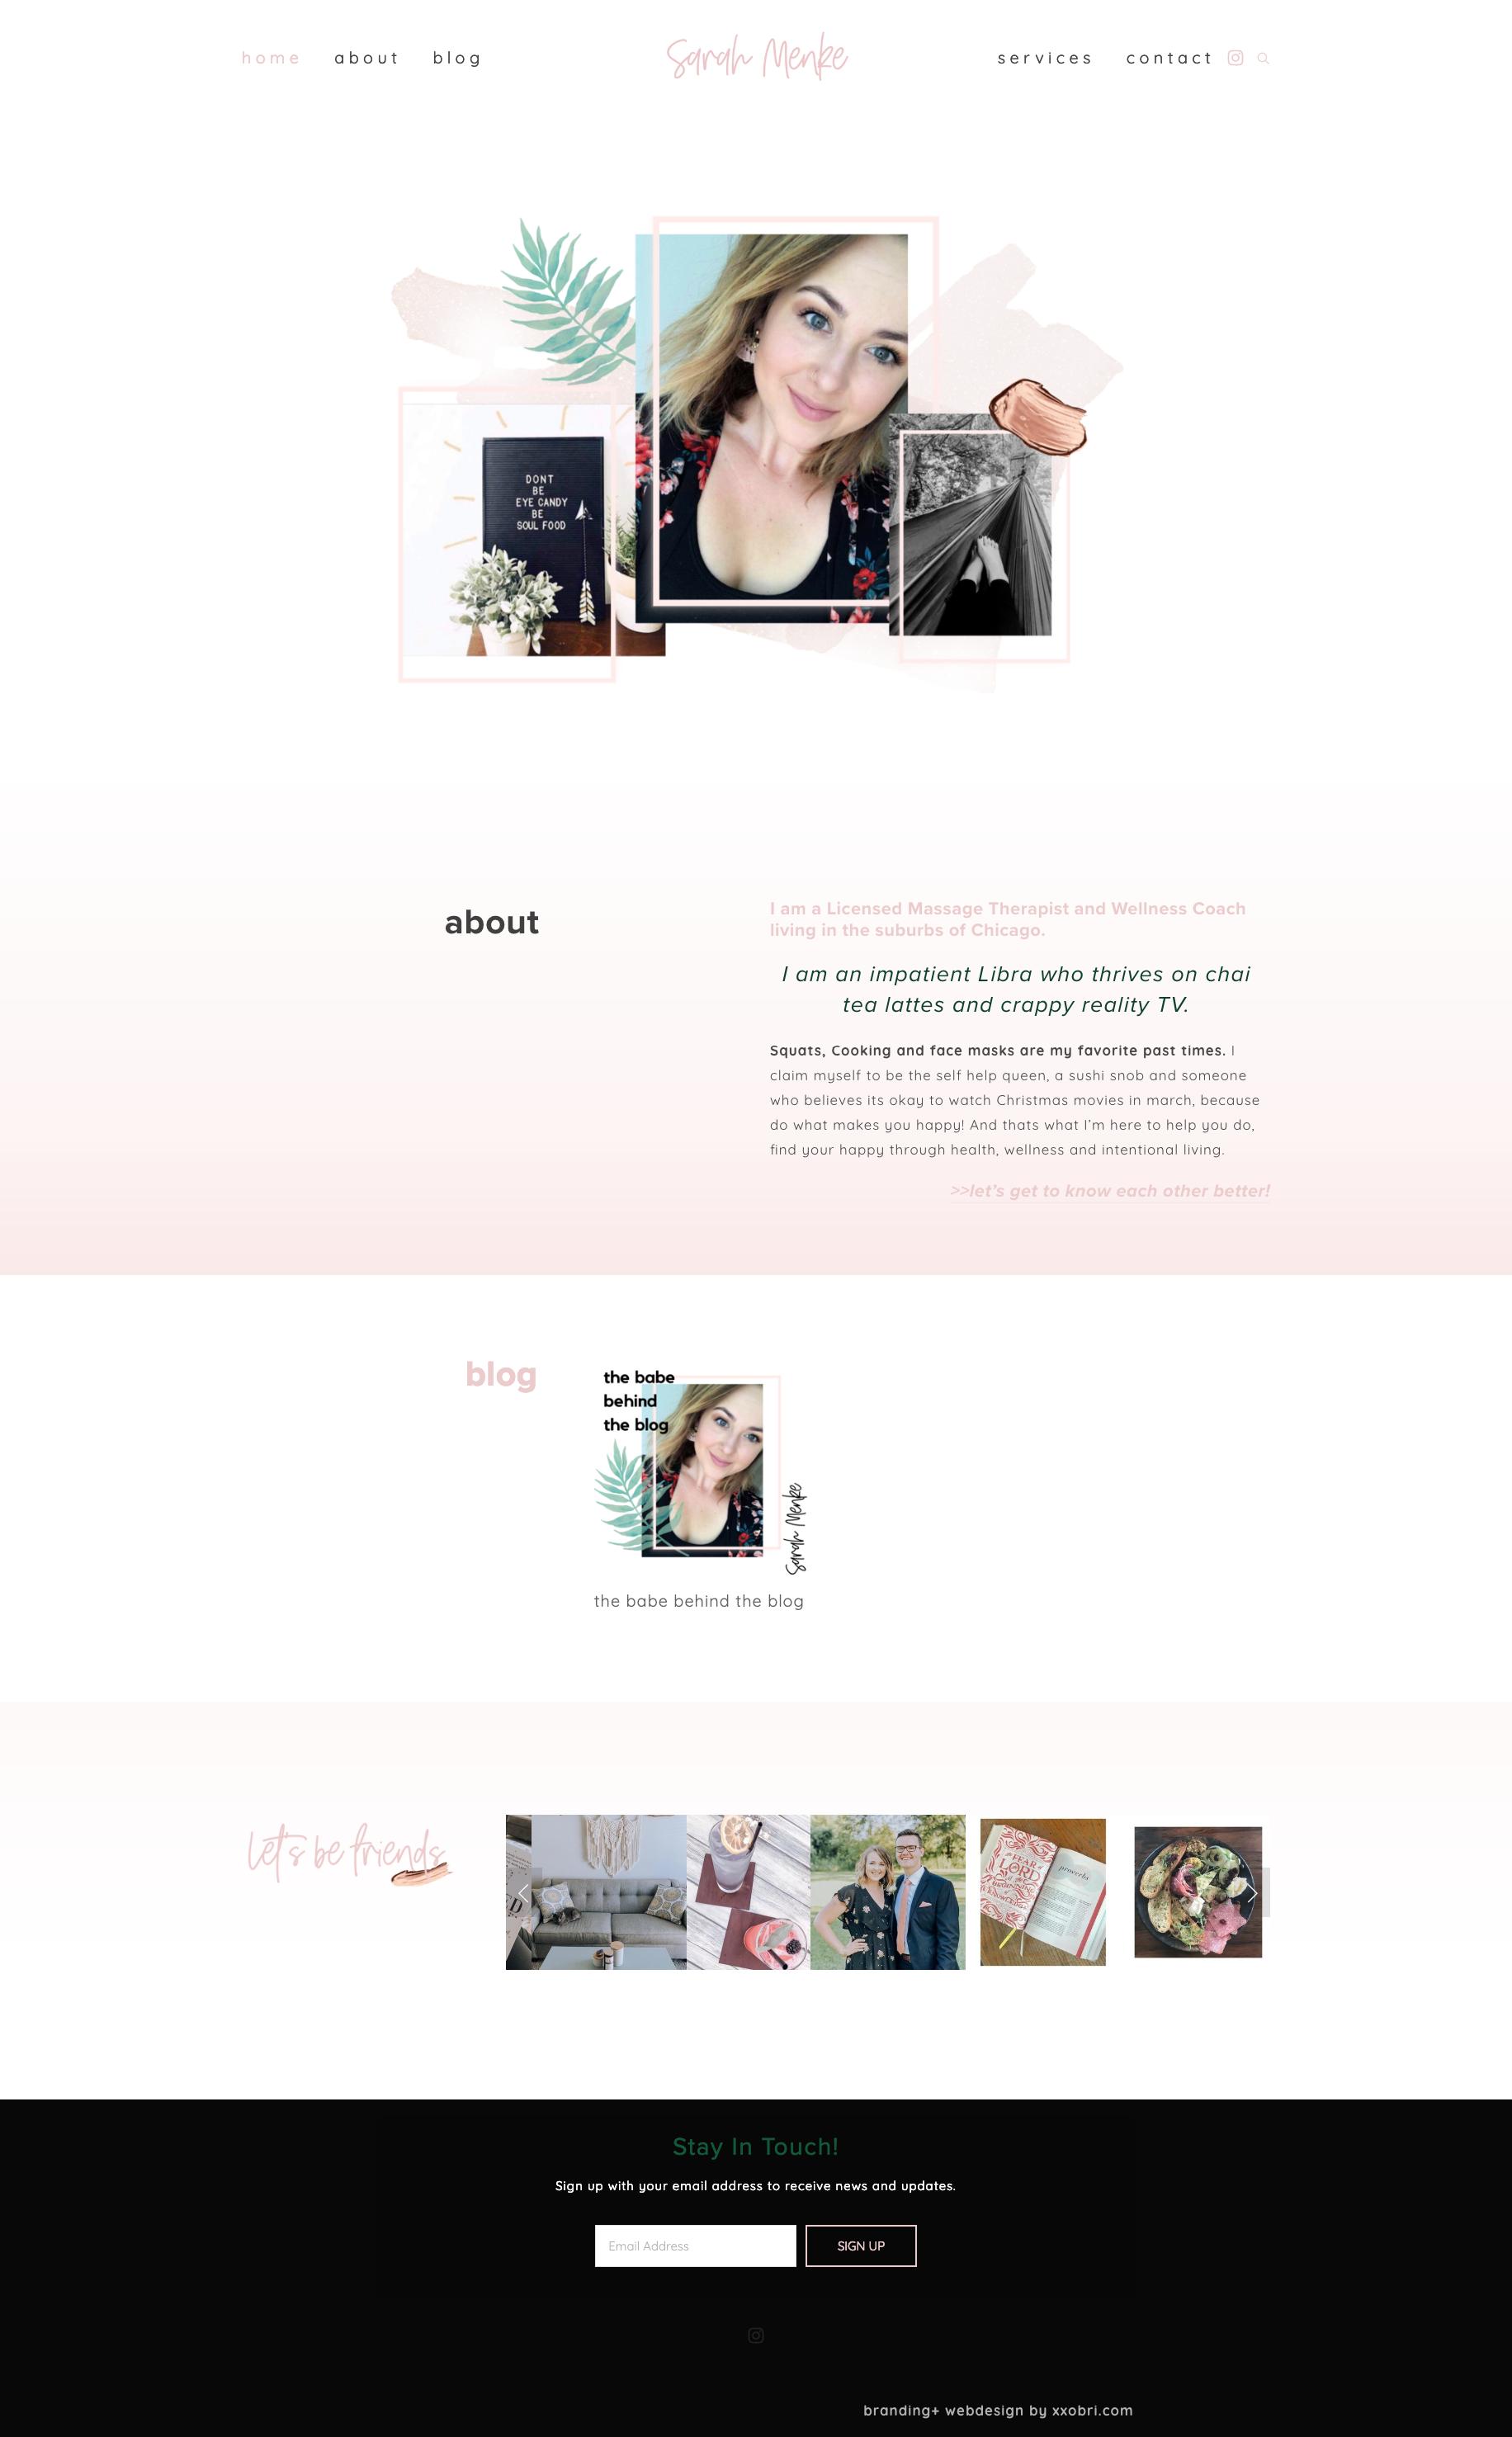 brand-website-design-xxobri.com-sarah-menke.png